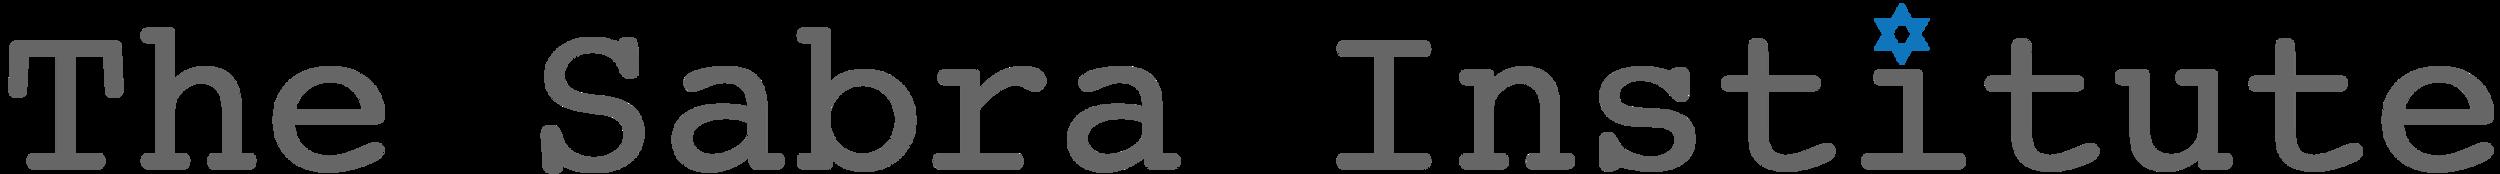 Sabra Institute Logo copy 2.png